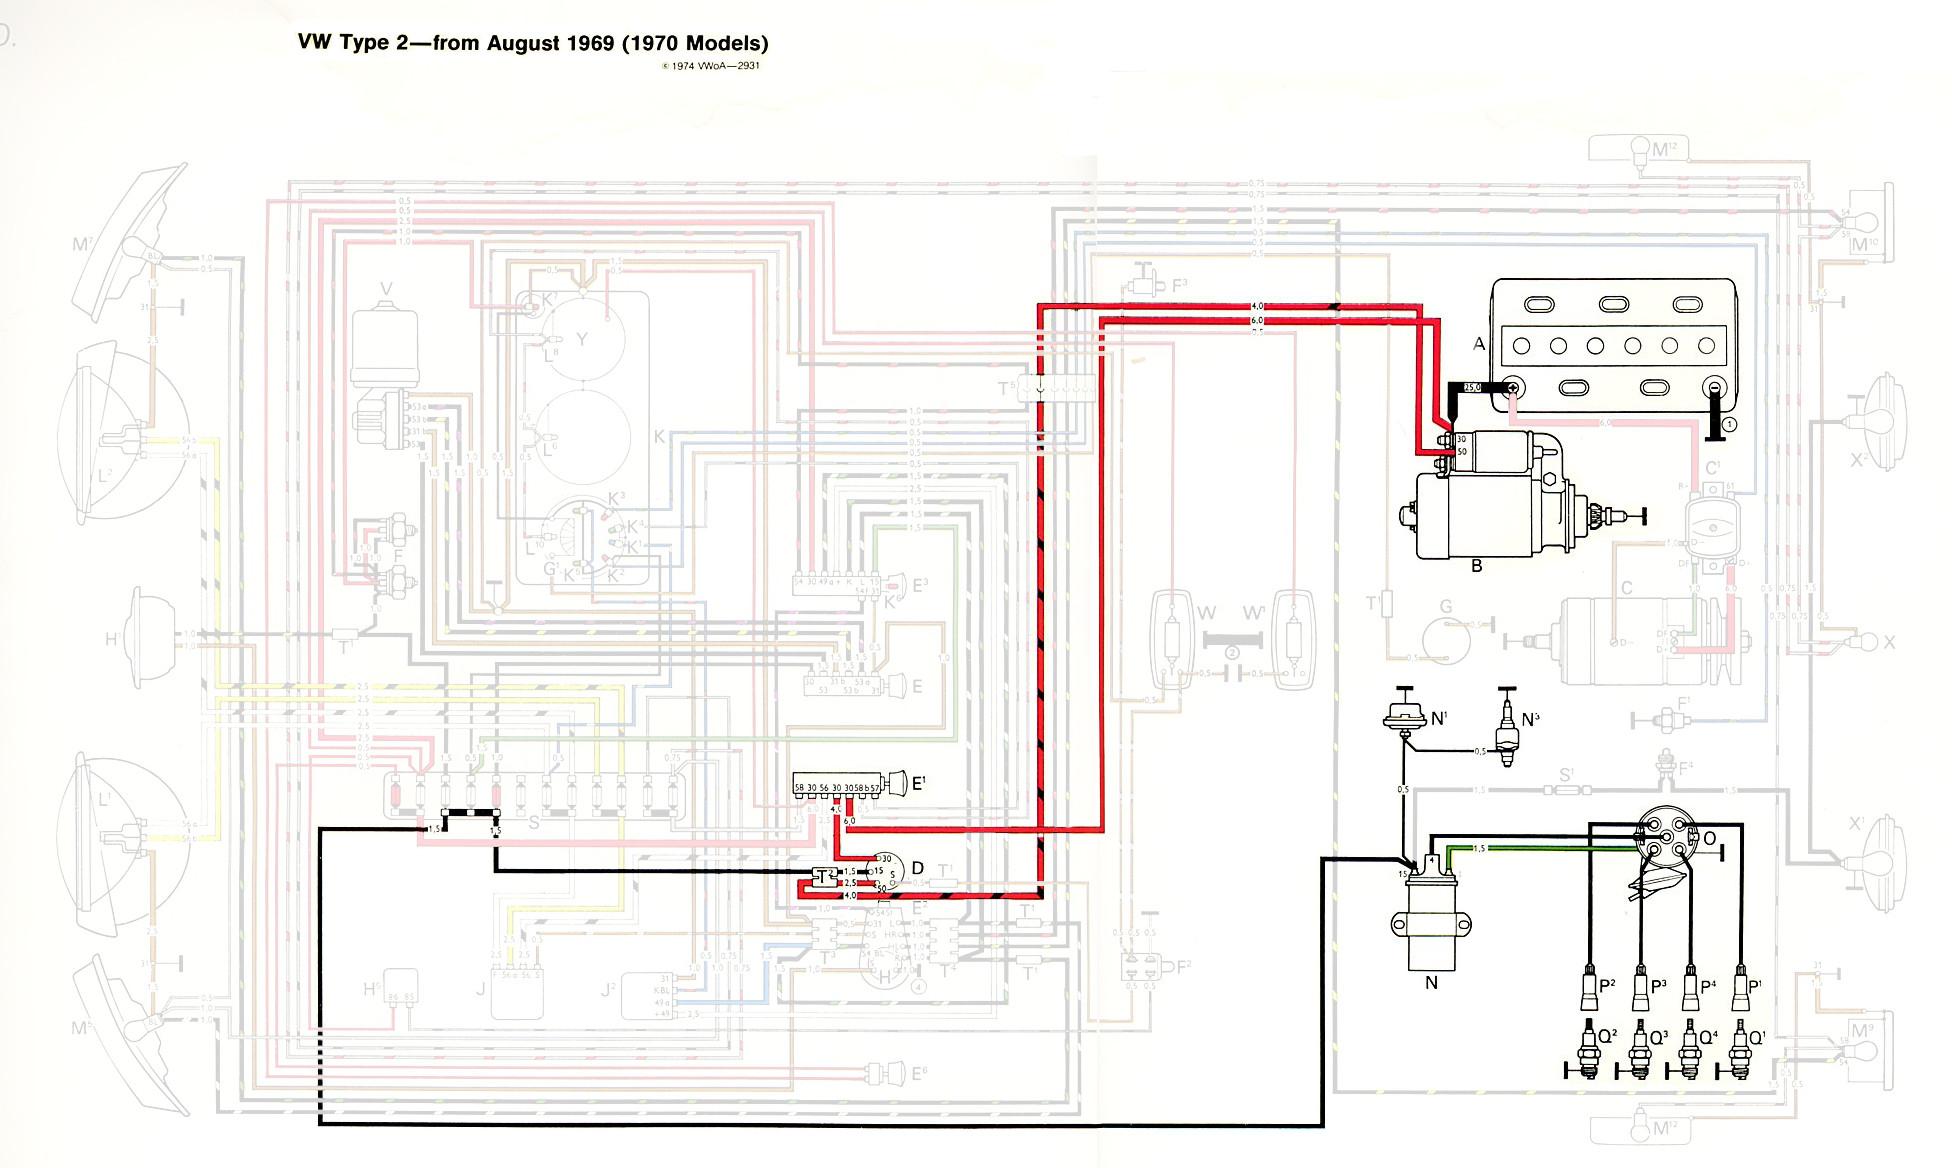 1970 vw type 2 wiring diagram mitsubishi eclipse radio thesamba diagrams